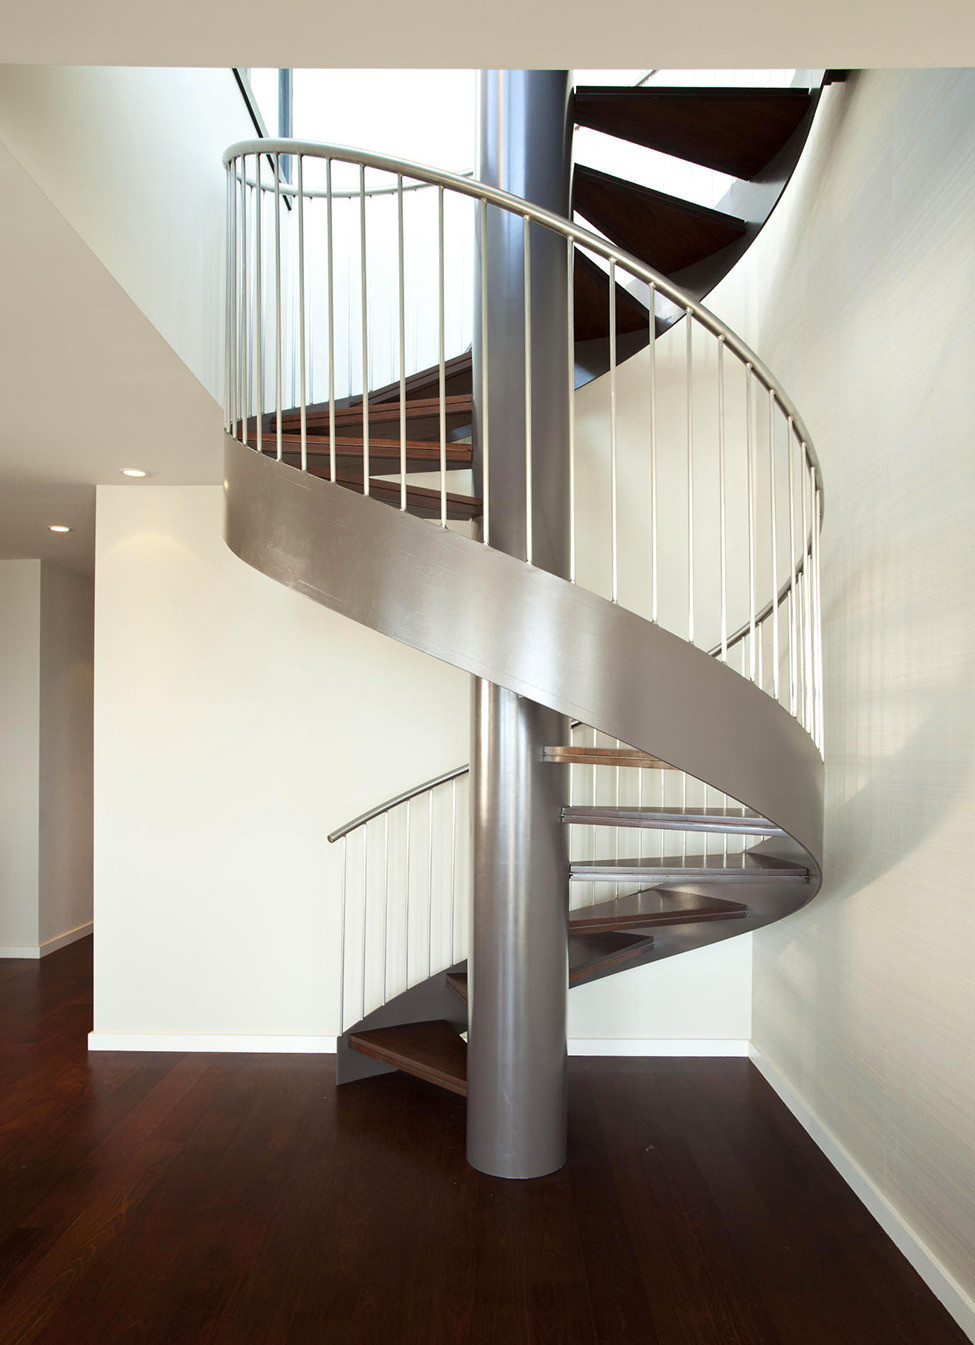 Серебристо-коричневая винтовая лестница